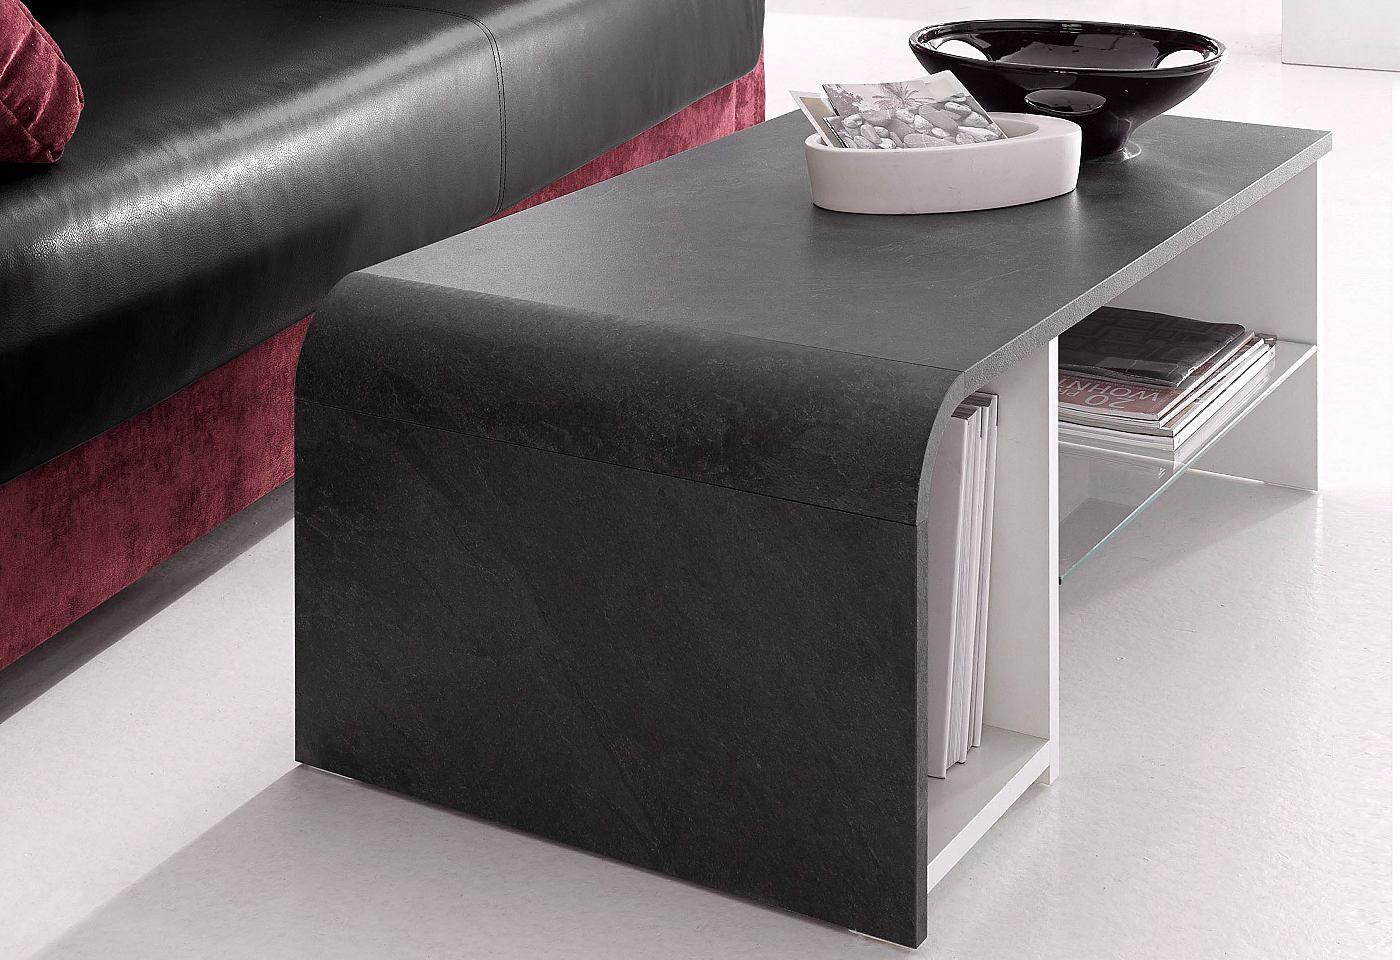 Inosign salontafel met glasplateau duifwitgoedservice for Act ii salon salem nh